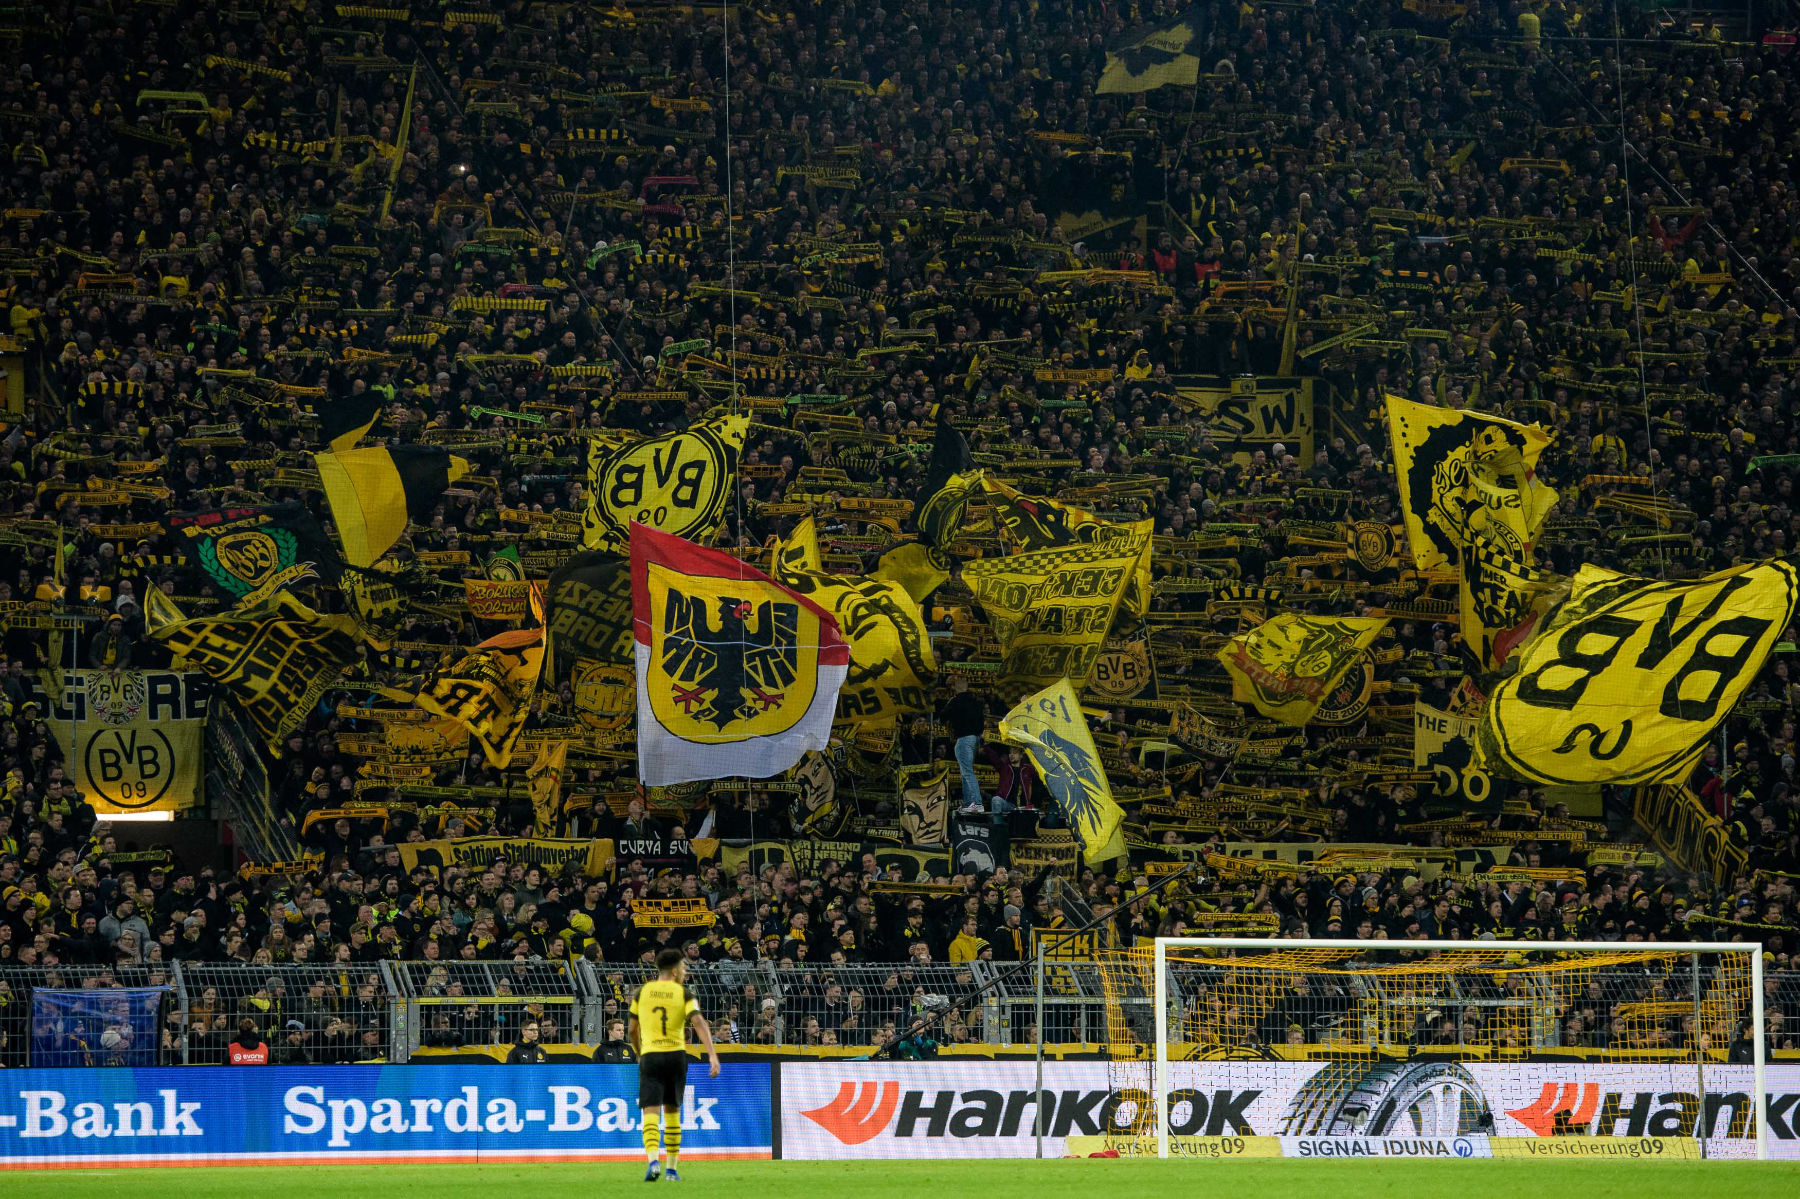 It S Serious Zagadou Warns Psg About Dortmund S Yellow Wall Psg Talk